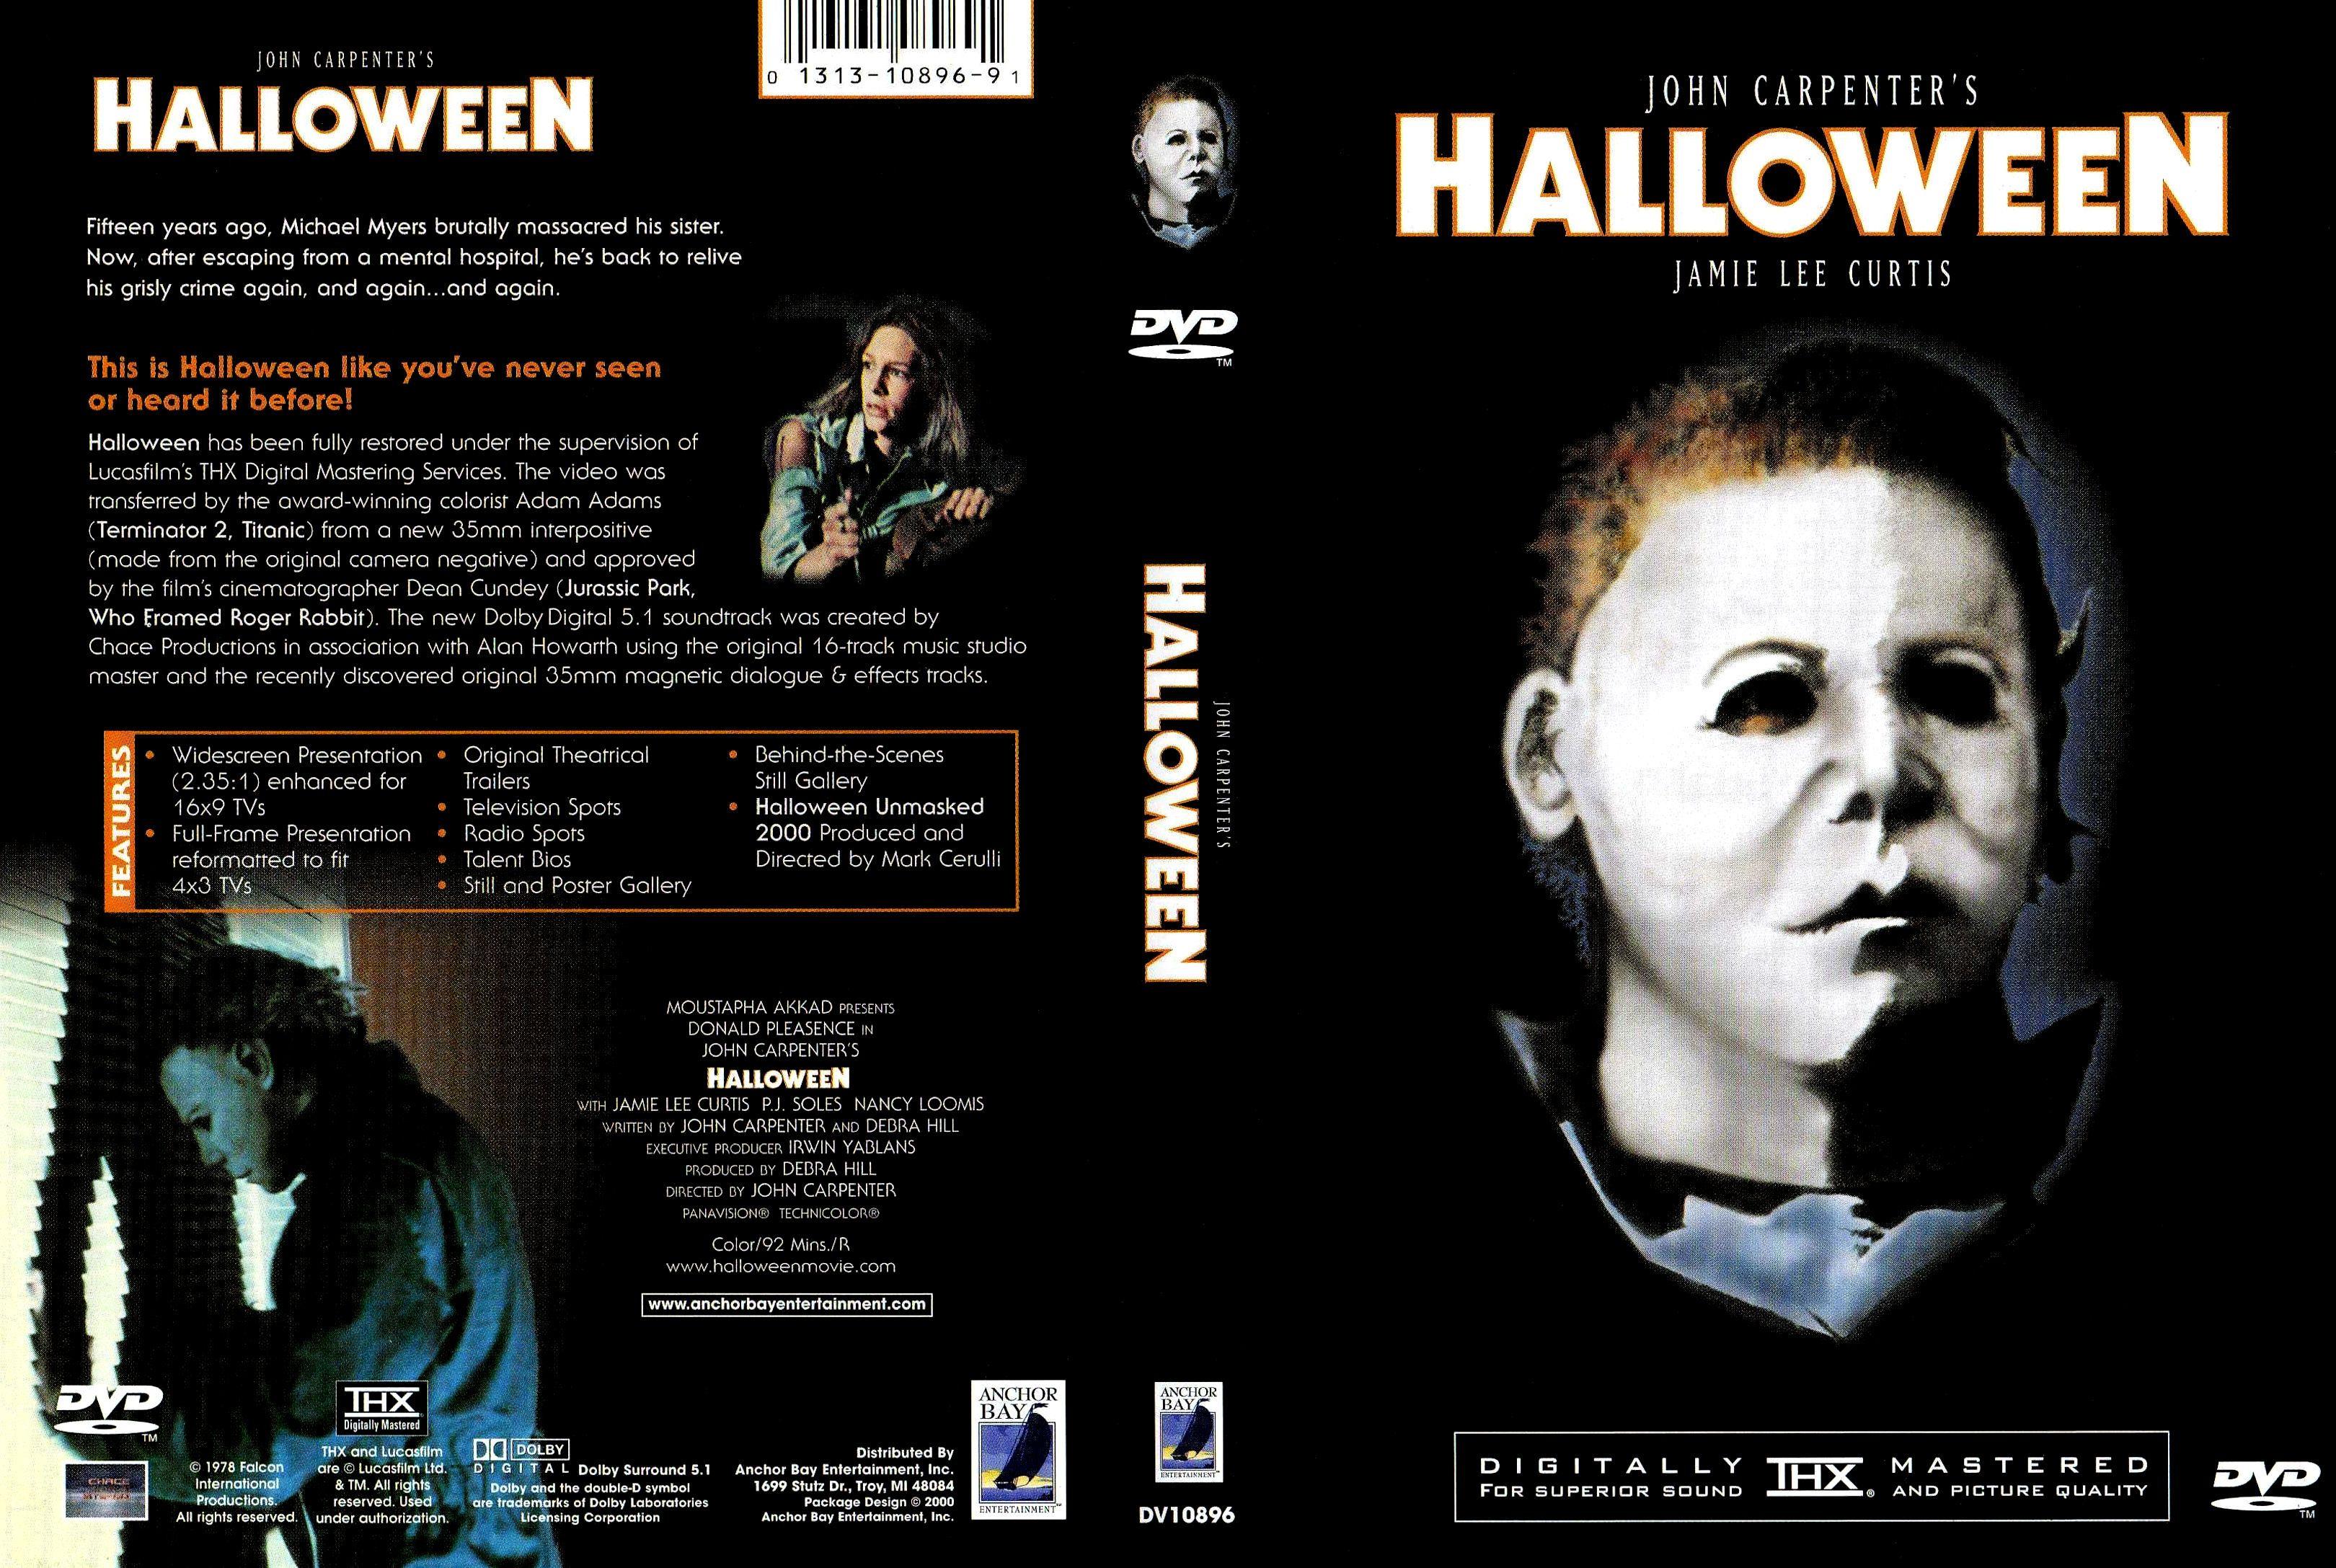 Halloween 5 Streaming Fr.Regarder Film Halloweenstreaming Vf Complet Hd Halloween John Carpenter Halloween Horror Dvd Scary Movies